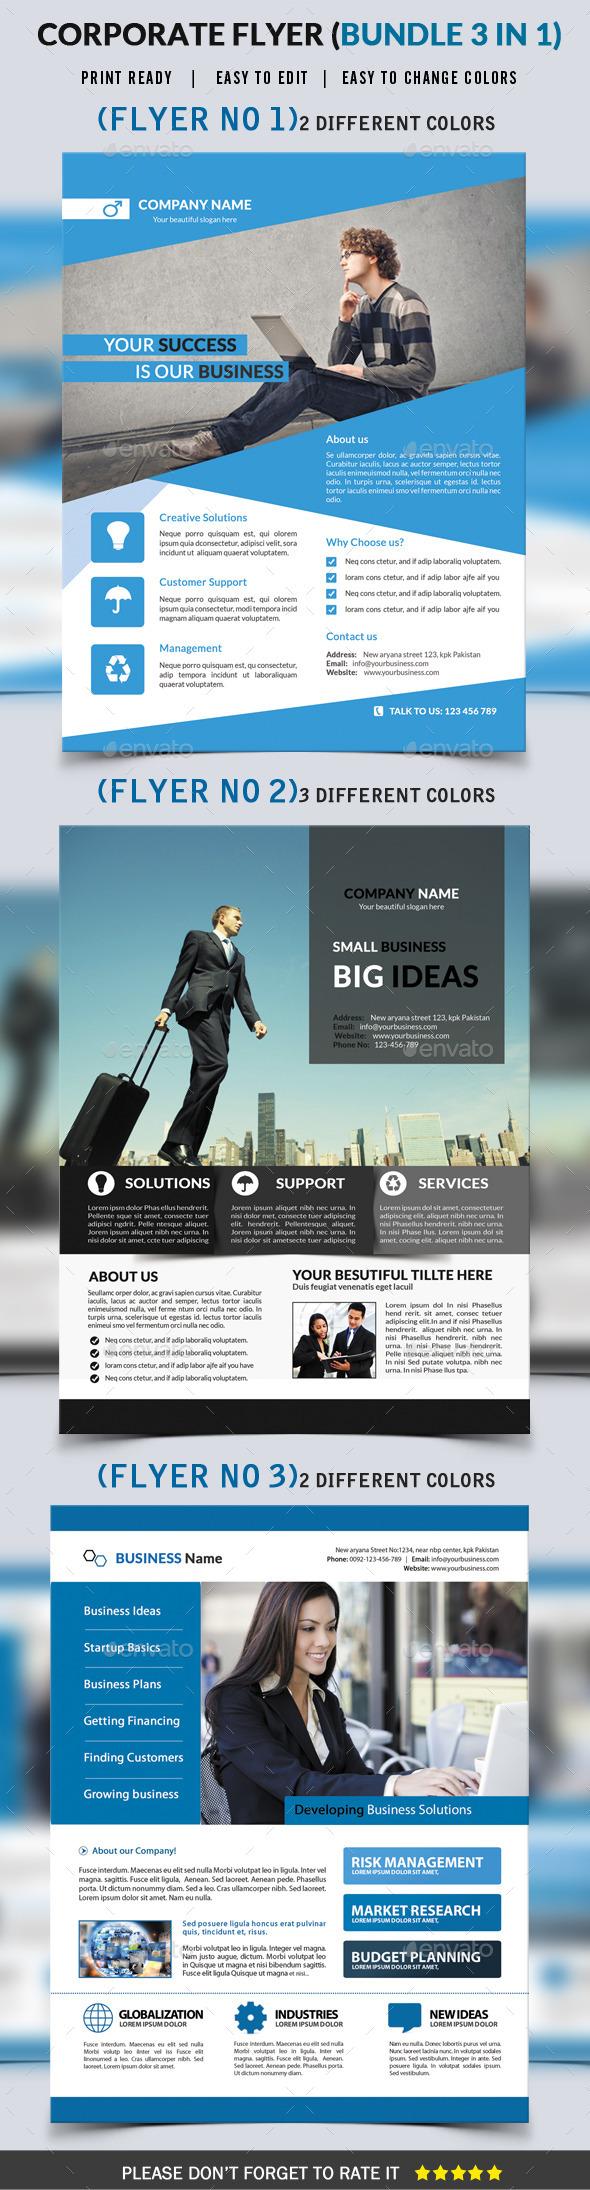 GraphicRiver Corporate Flyer Bundle 3 in 1 9364367